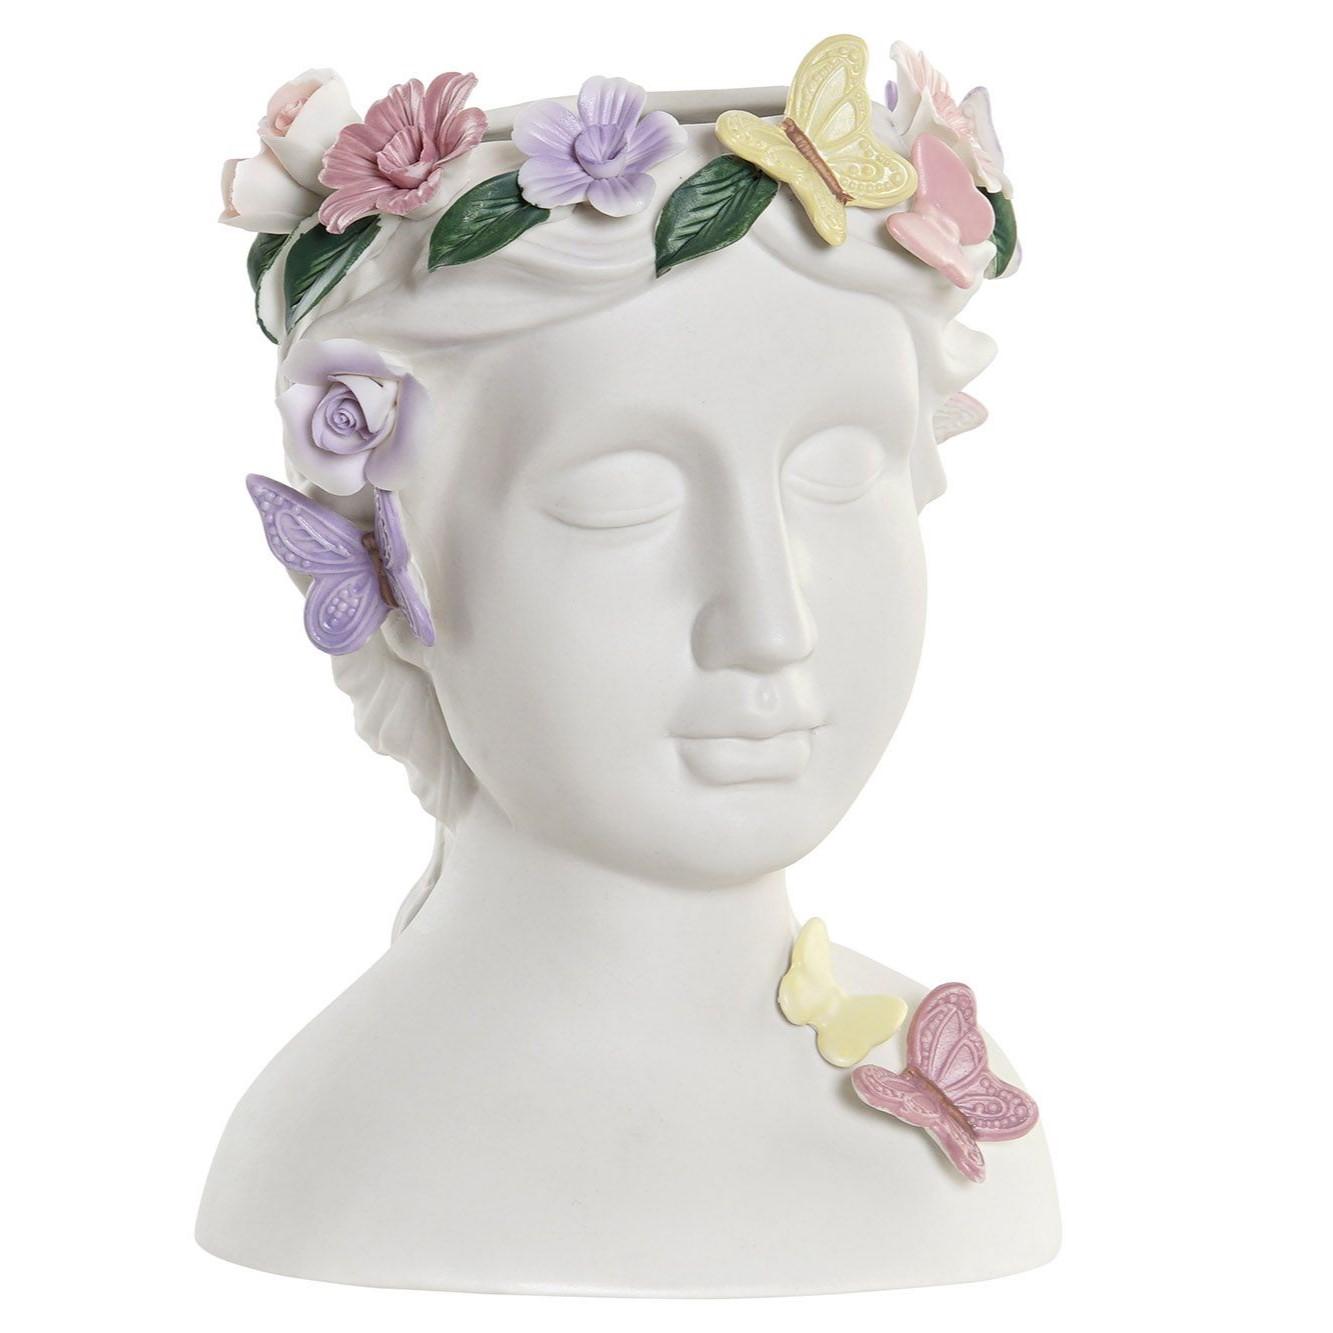 32616-jarron-rostro-floral.jpeg